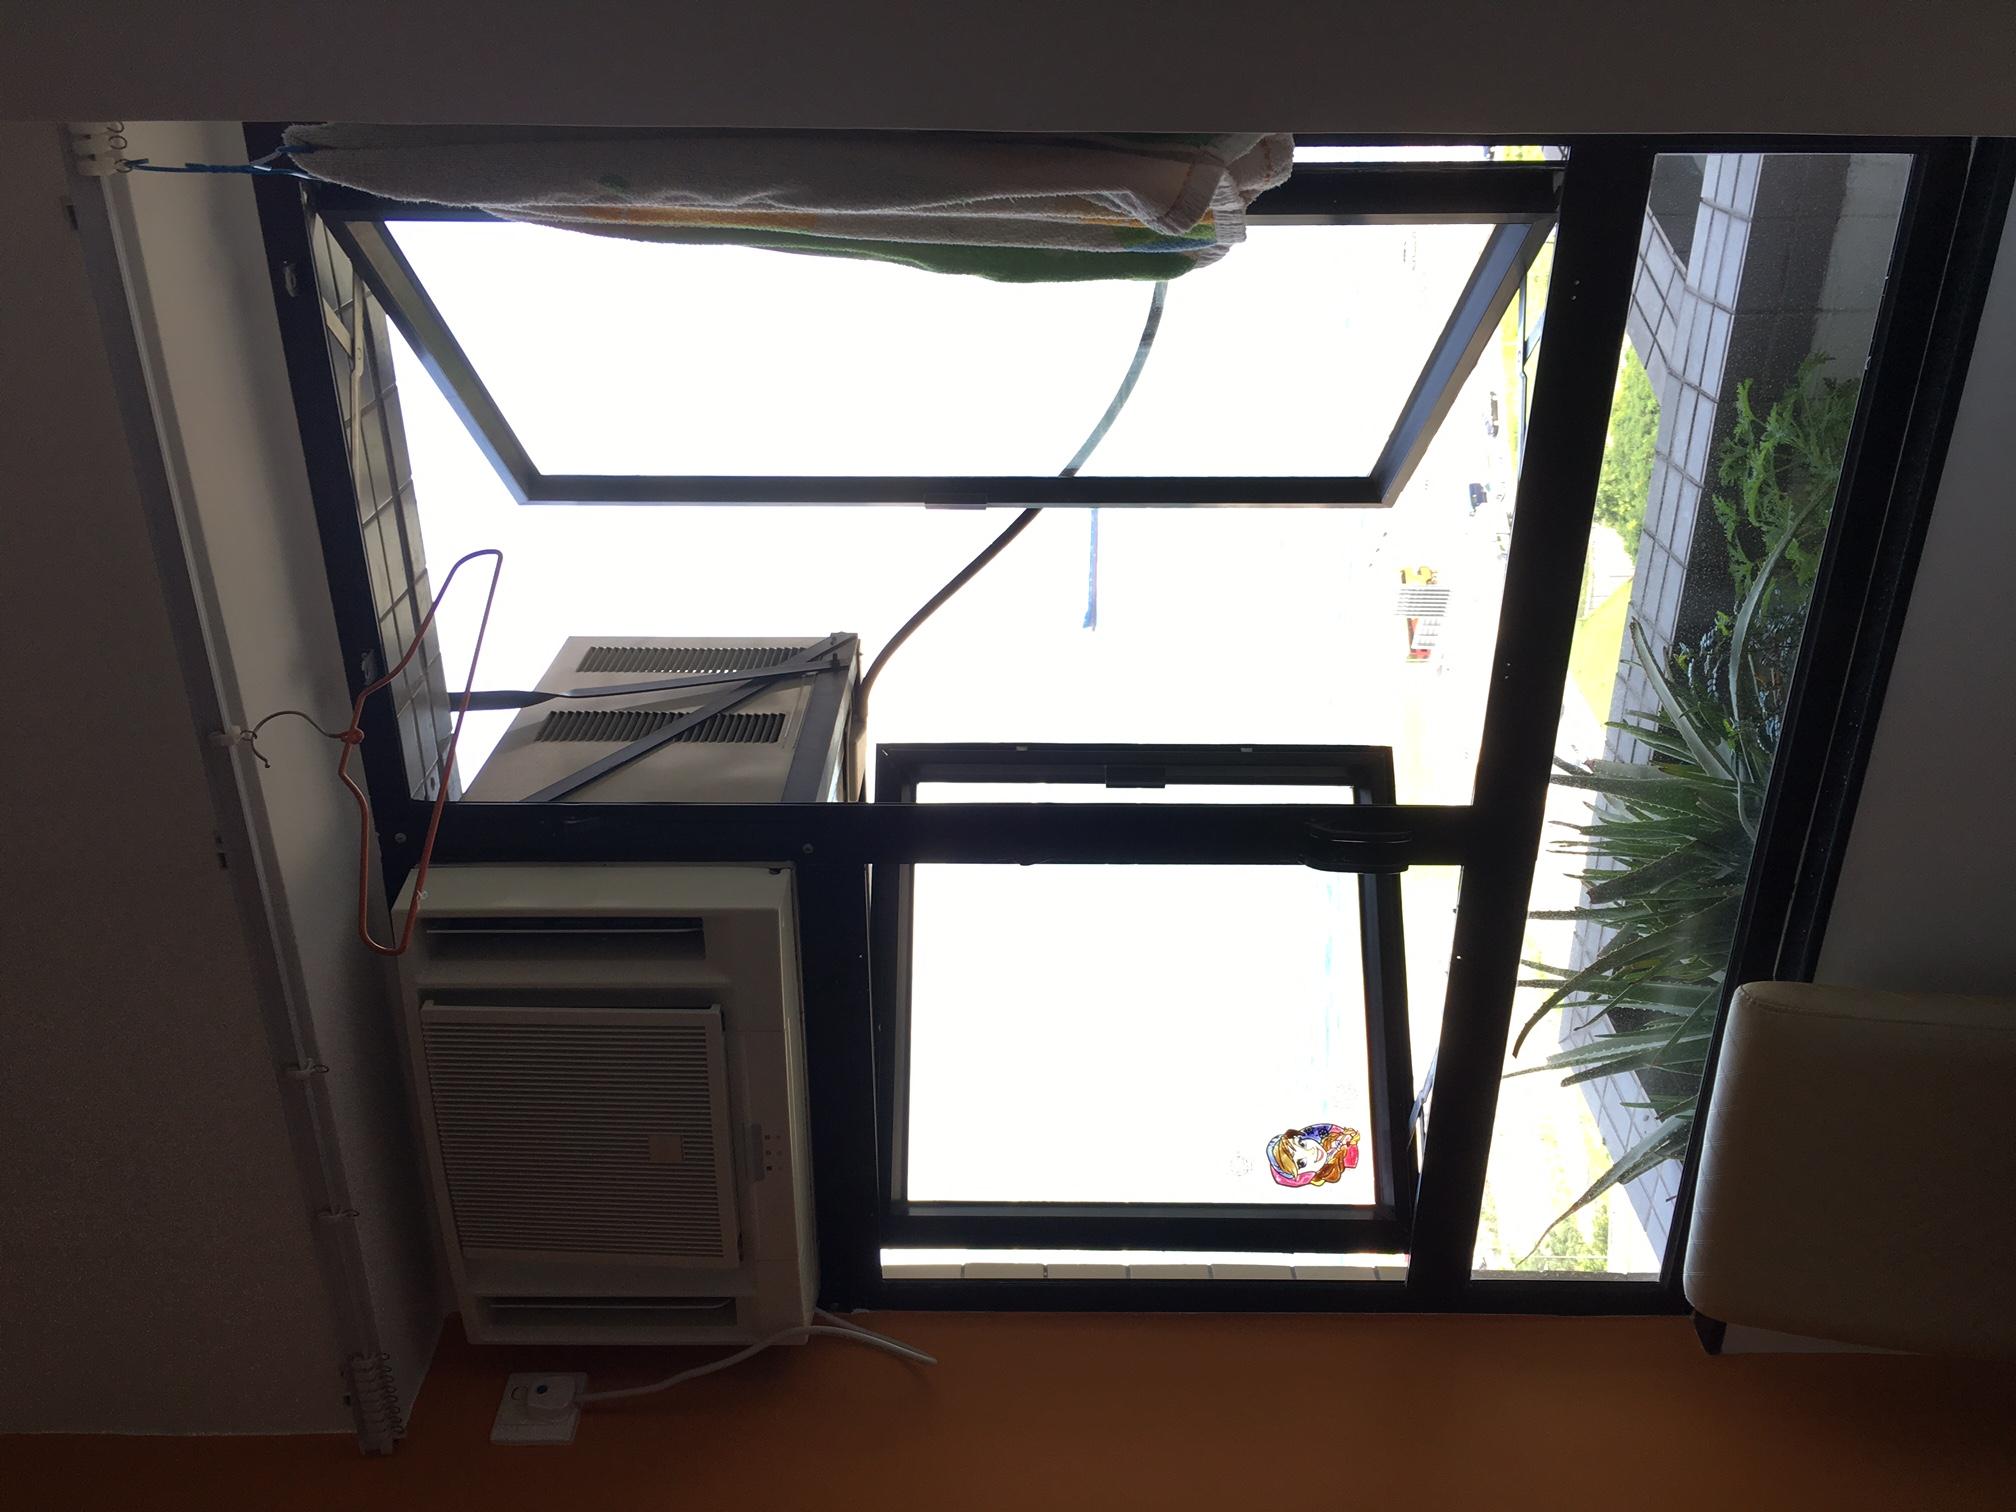 驗樓驗窗Building Inspection